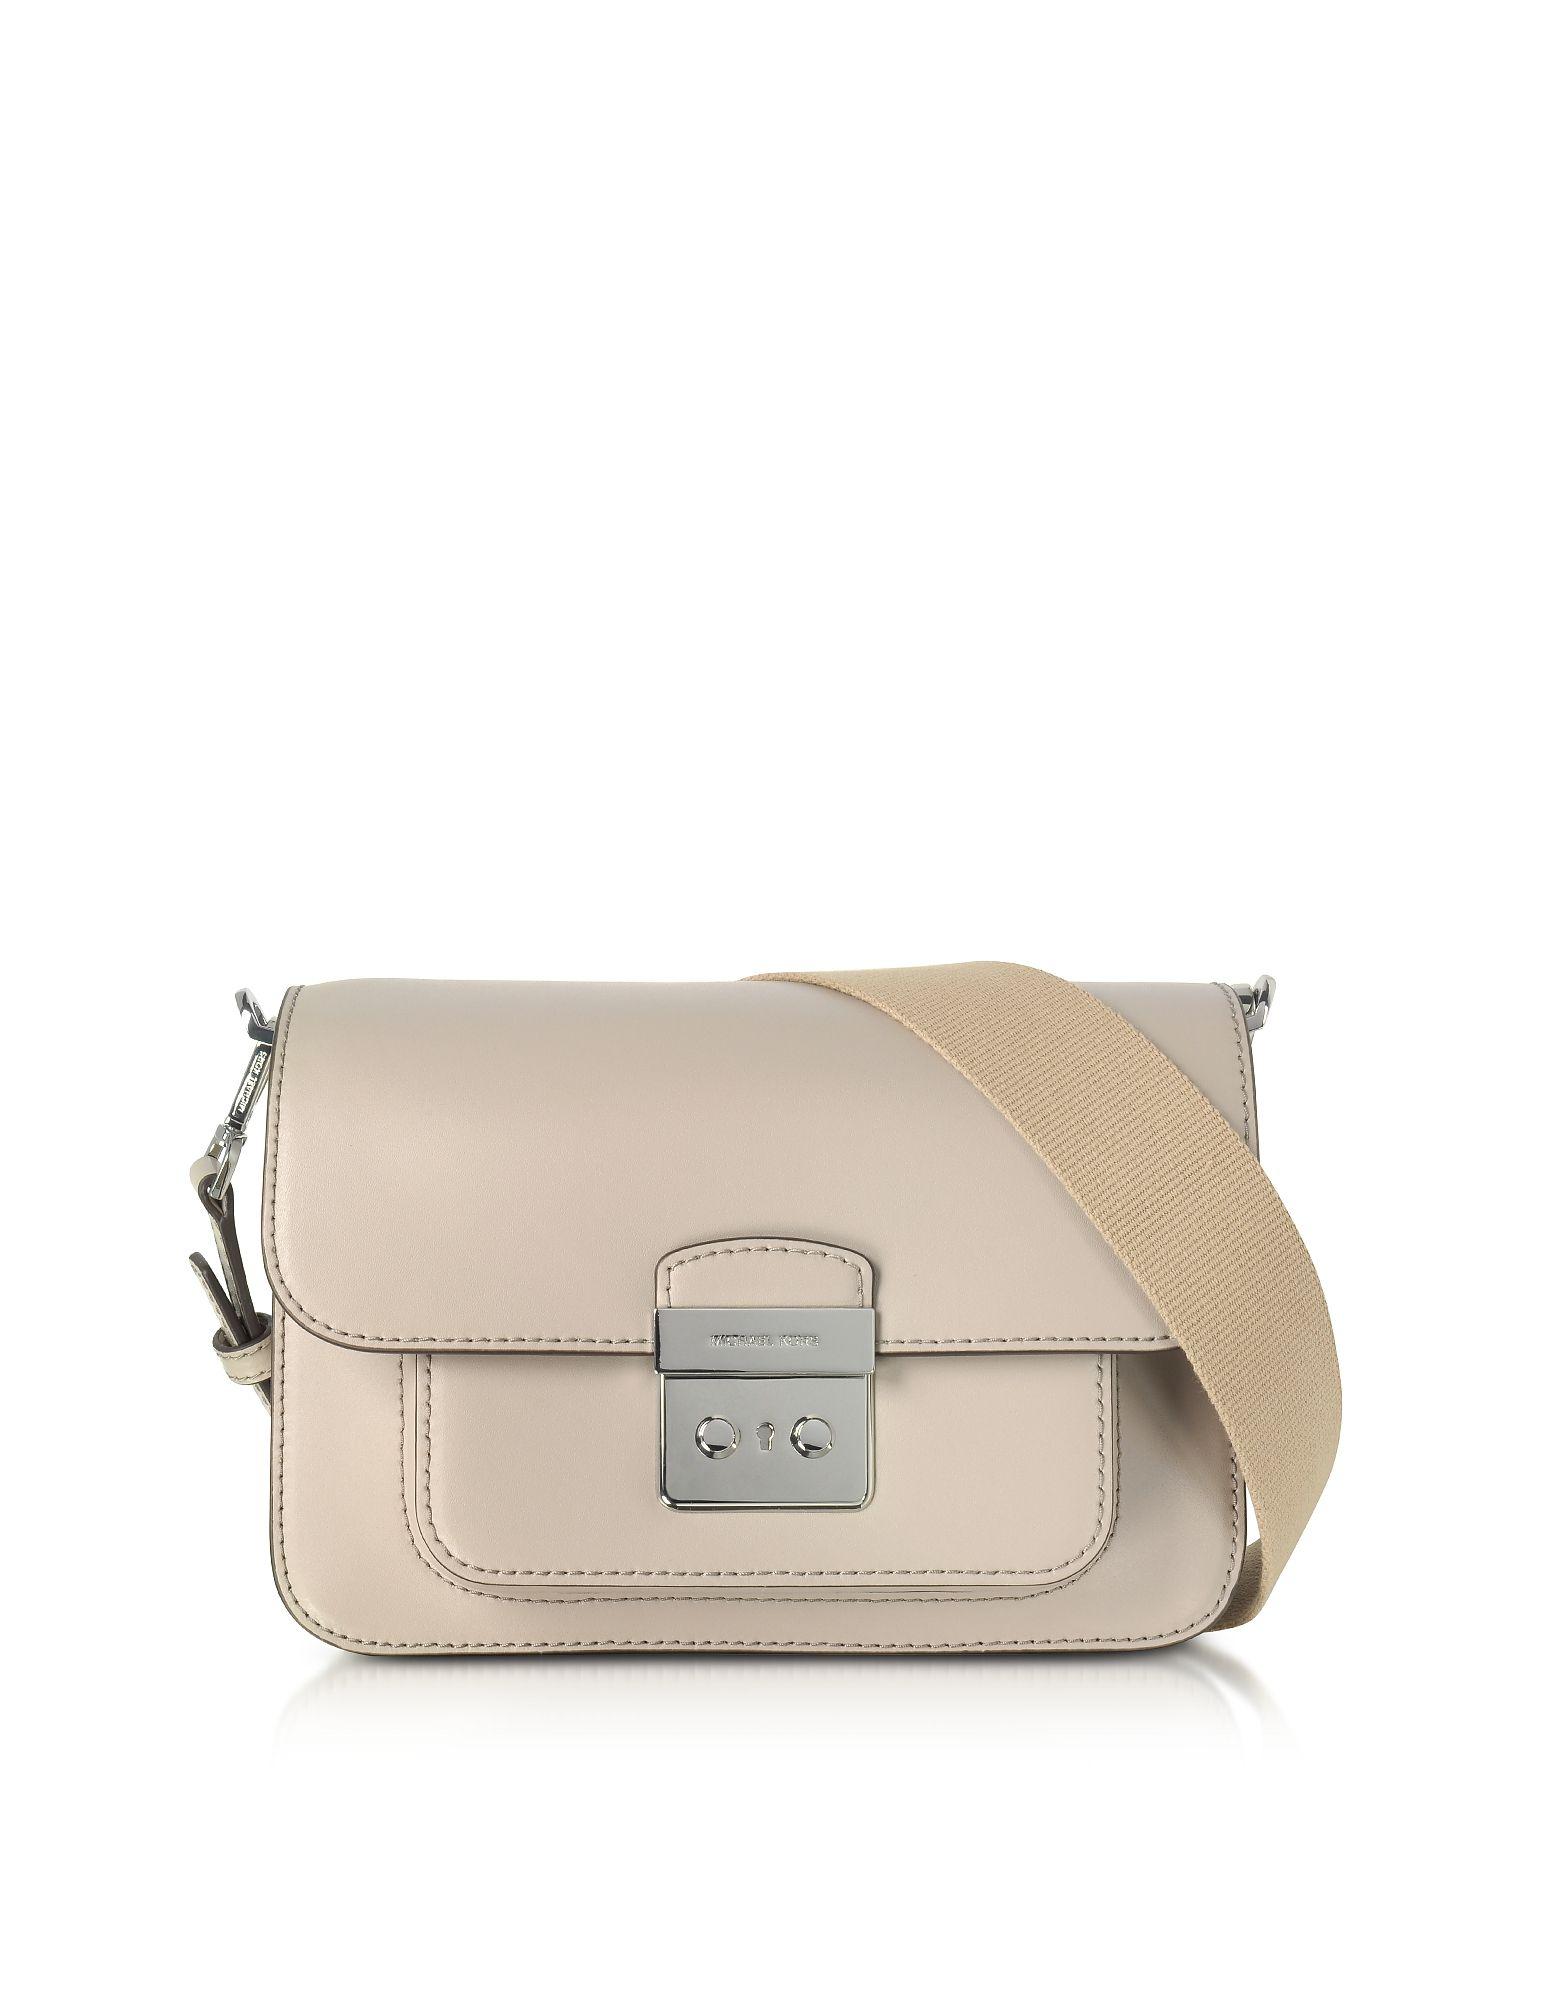 8bdcda9d5559 MICHAEL KORS SLOAN EDITOR LARGE CEMENT LEATHER SHOULDER BAG.  michaelkors   bags  shoulder bags  leather